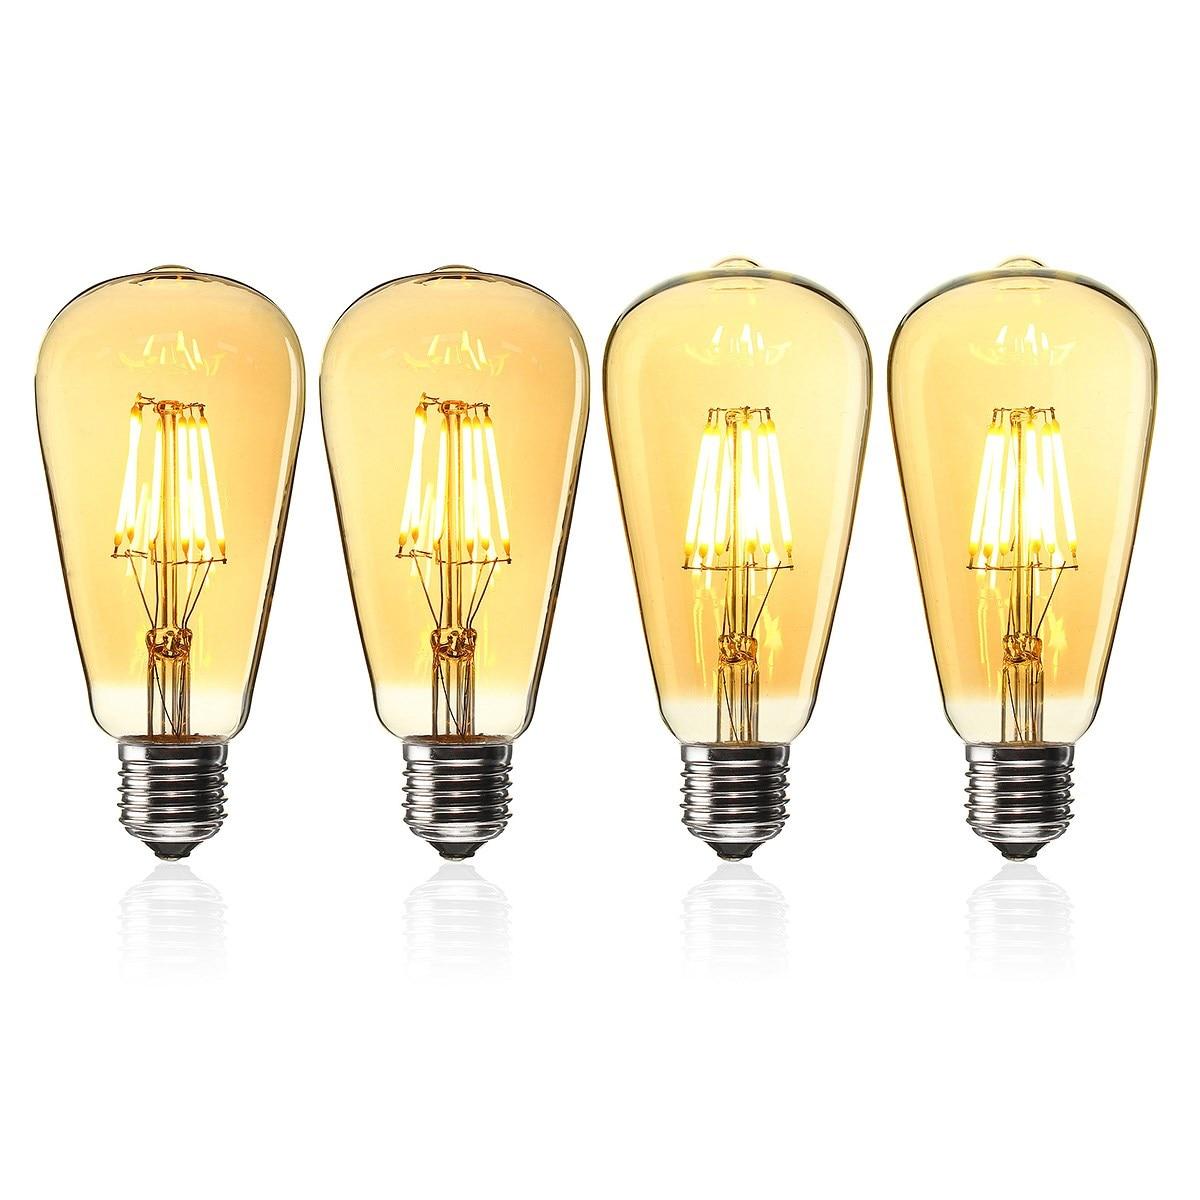 Smuxi E27 St64 6w Golden Cover Dimmable Edison Retro Vintage Filament Cob Led Bulb Light Lamp Ac110/220v Lights & Lighting